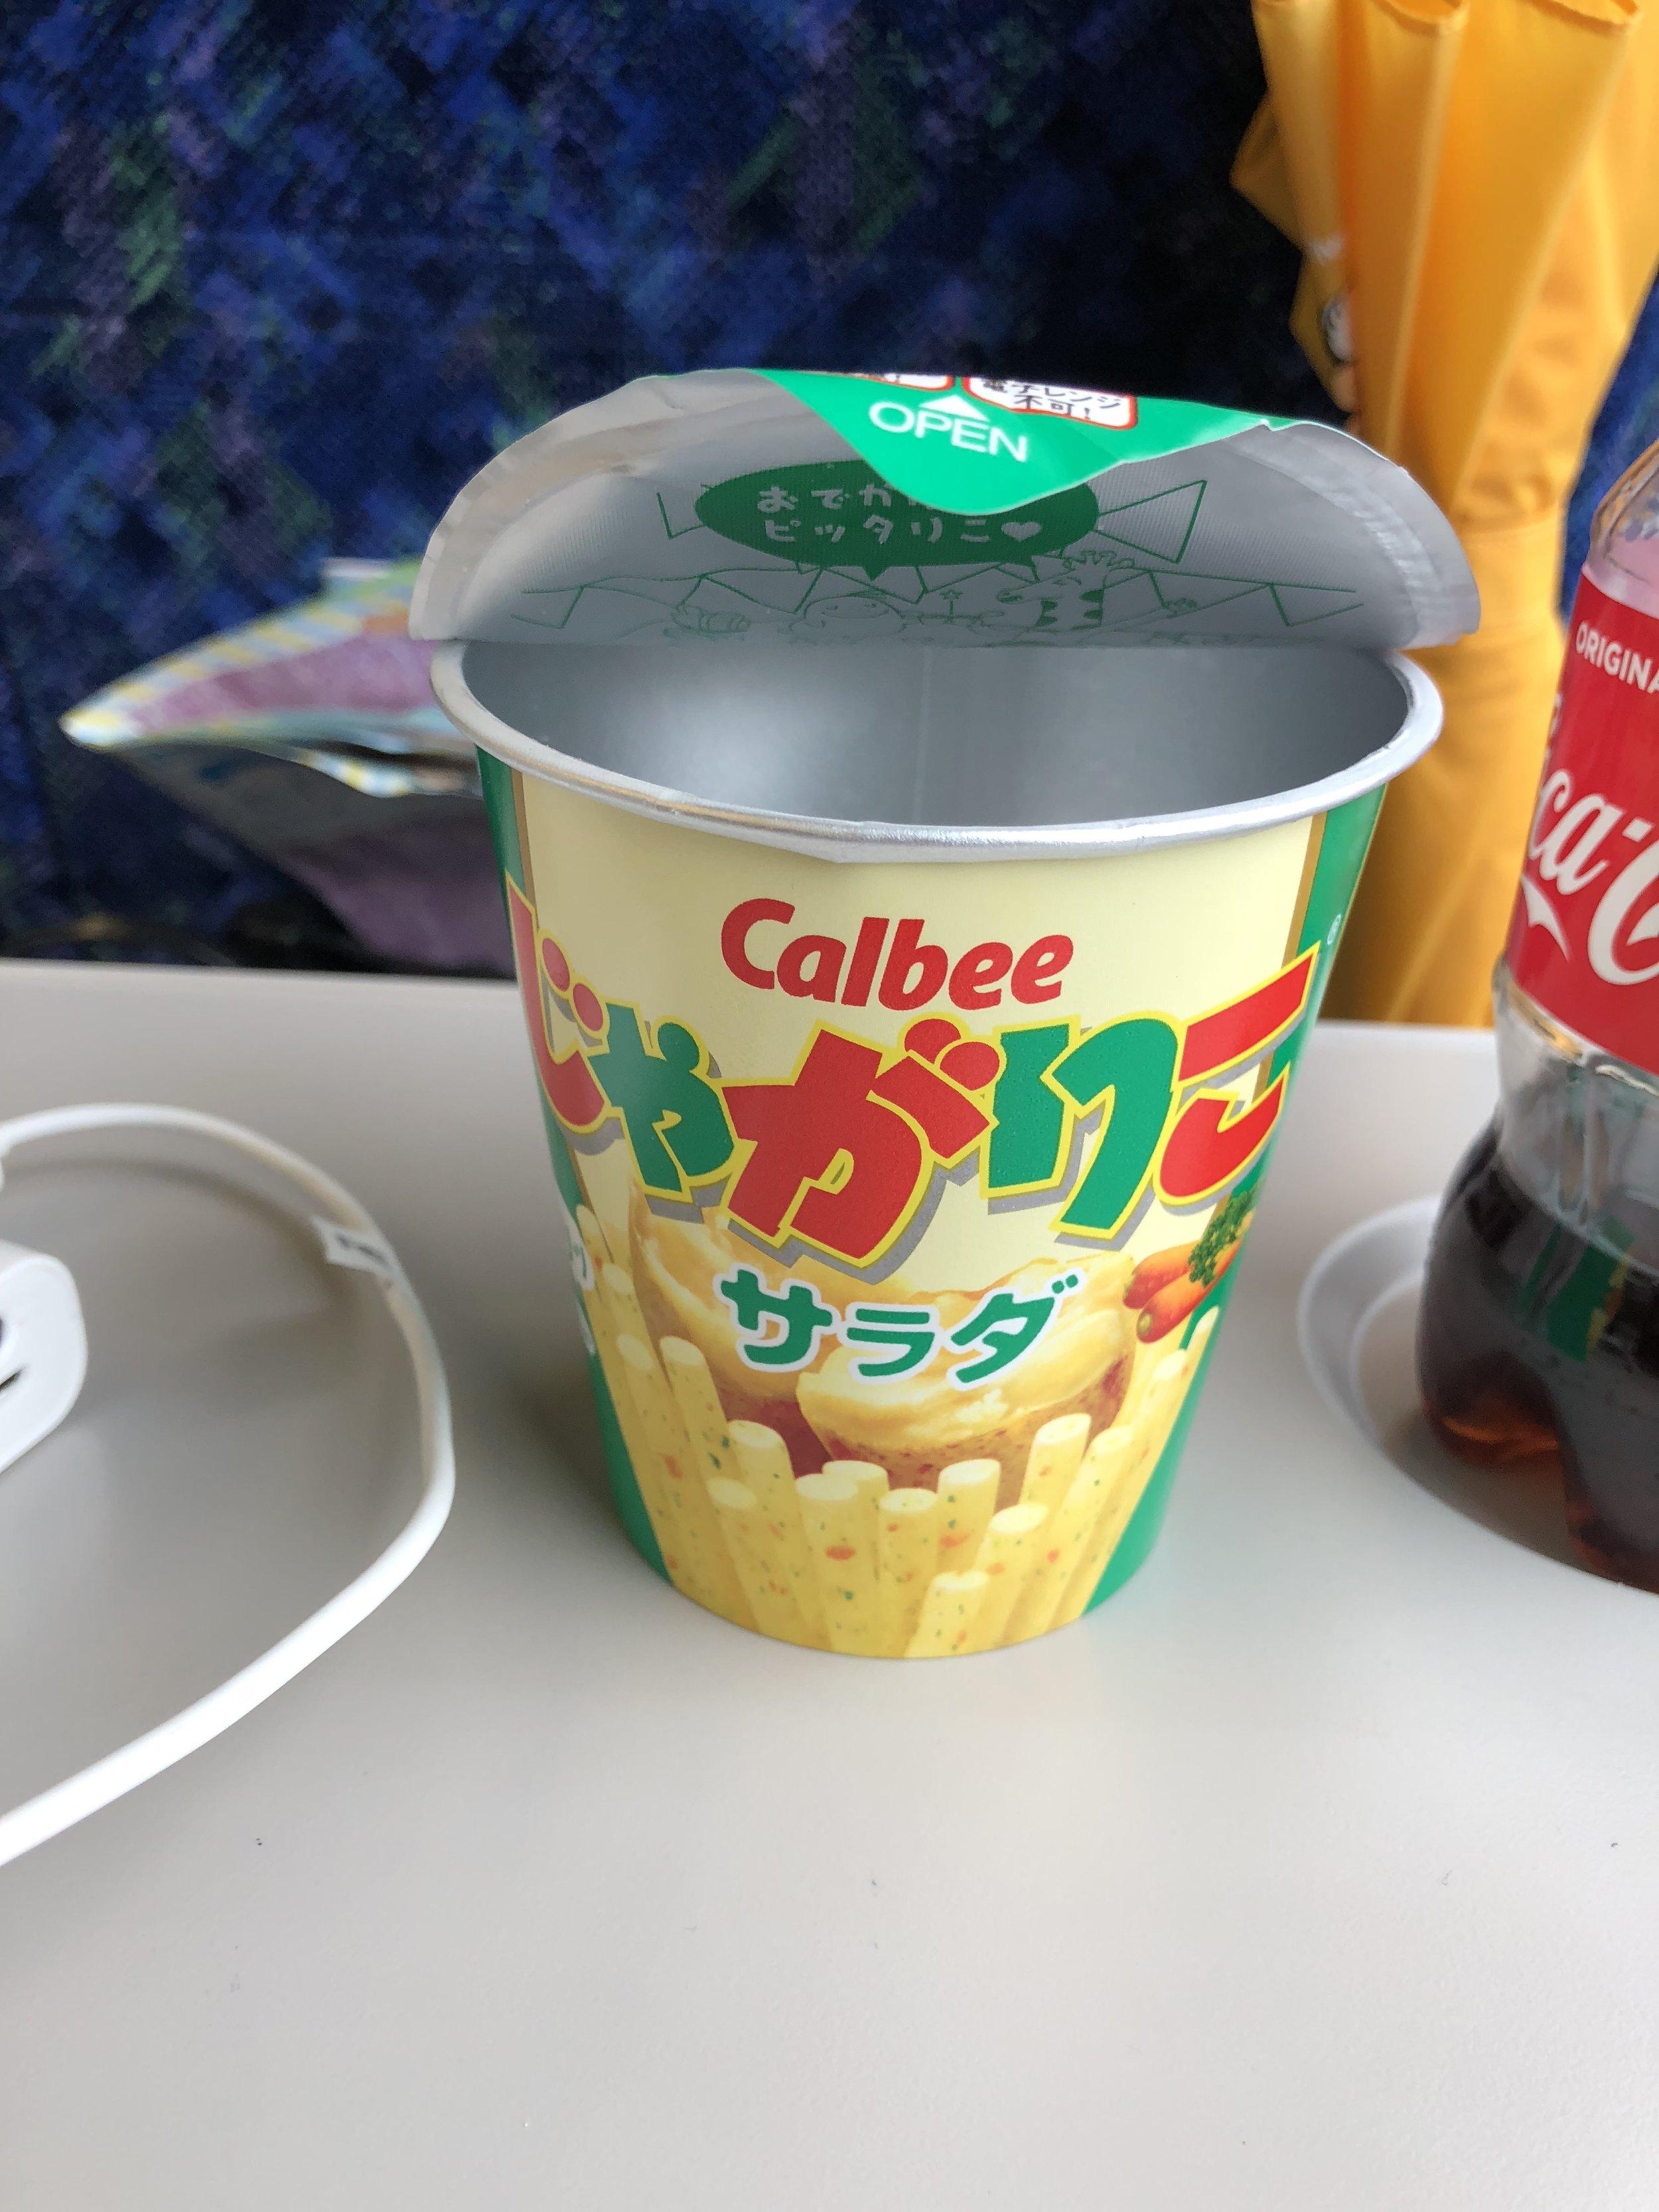 Calbee Japanese Snack